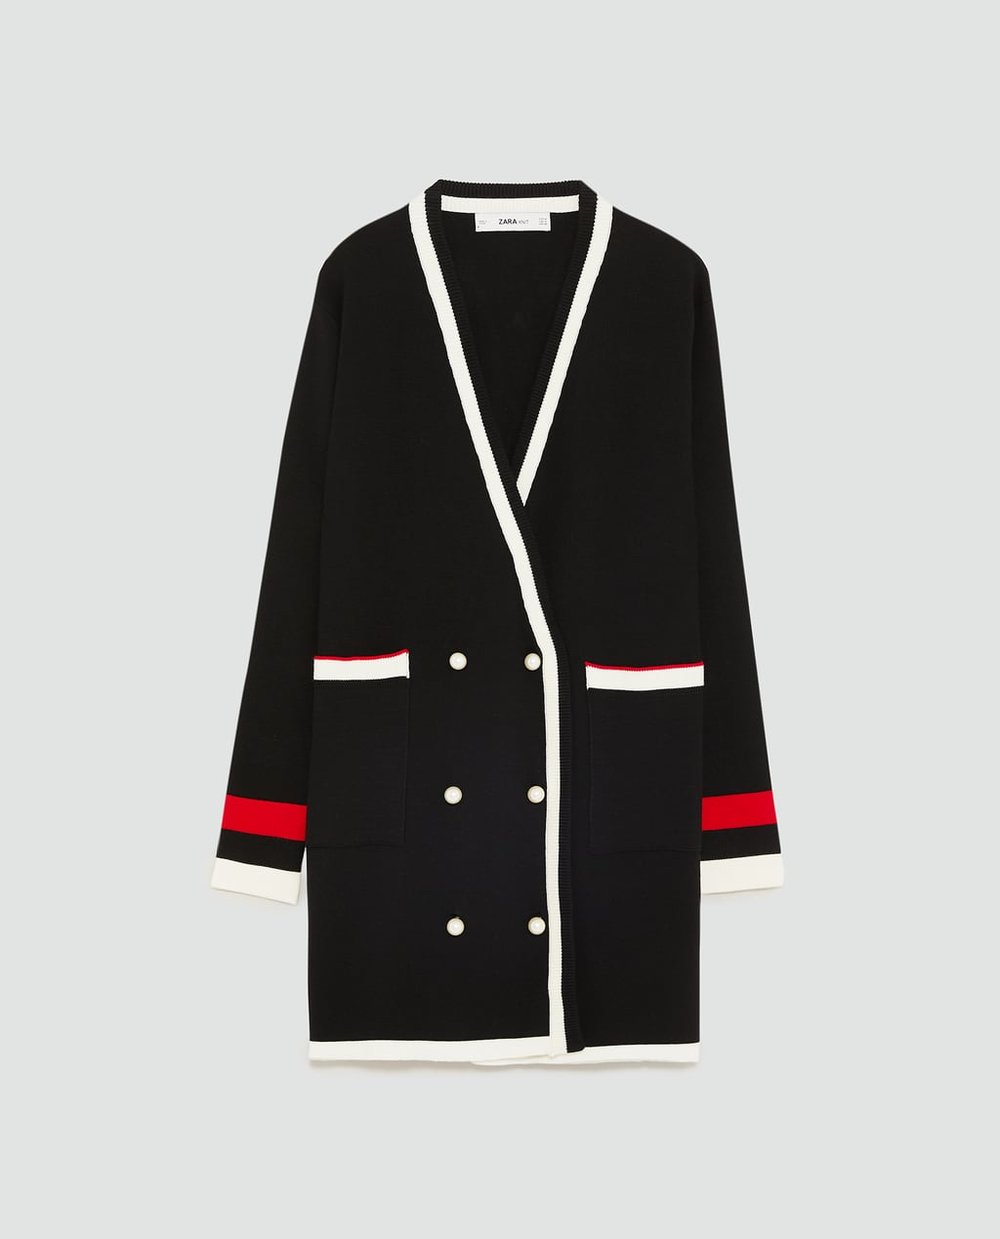 Zara Jacket: 6254/014